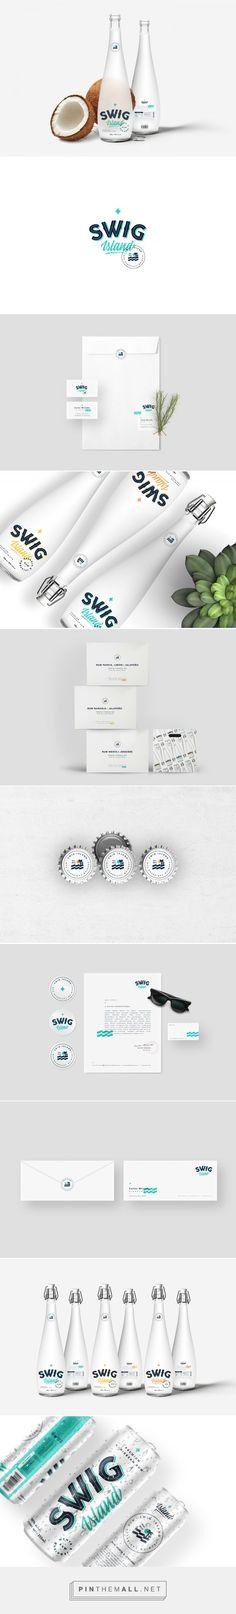 SWIG Island on Behance | Fivestar Branding – Design and Branding Agency & Inspiration Gallery